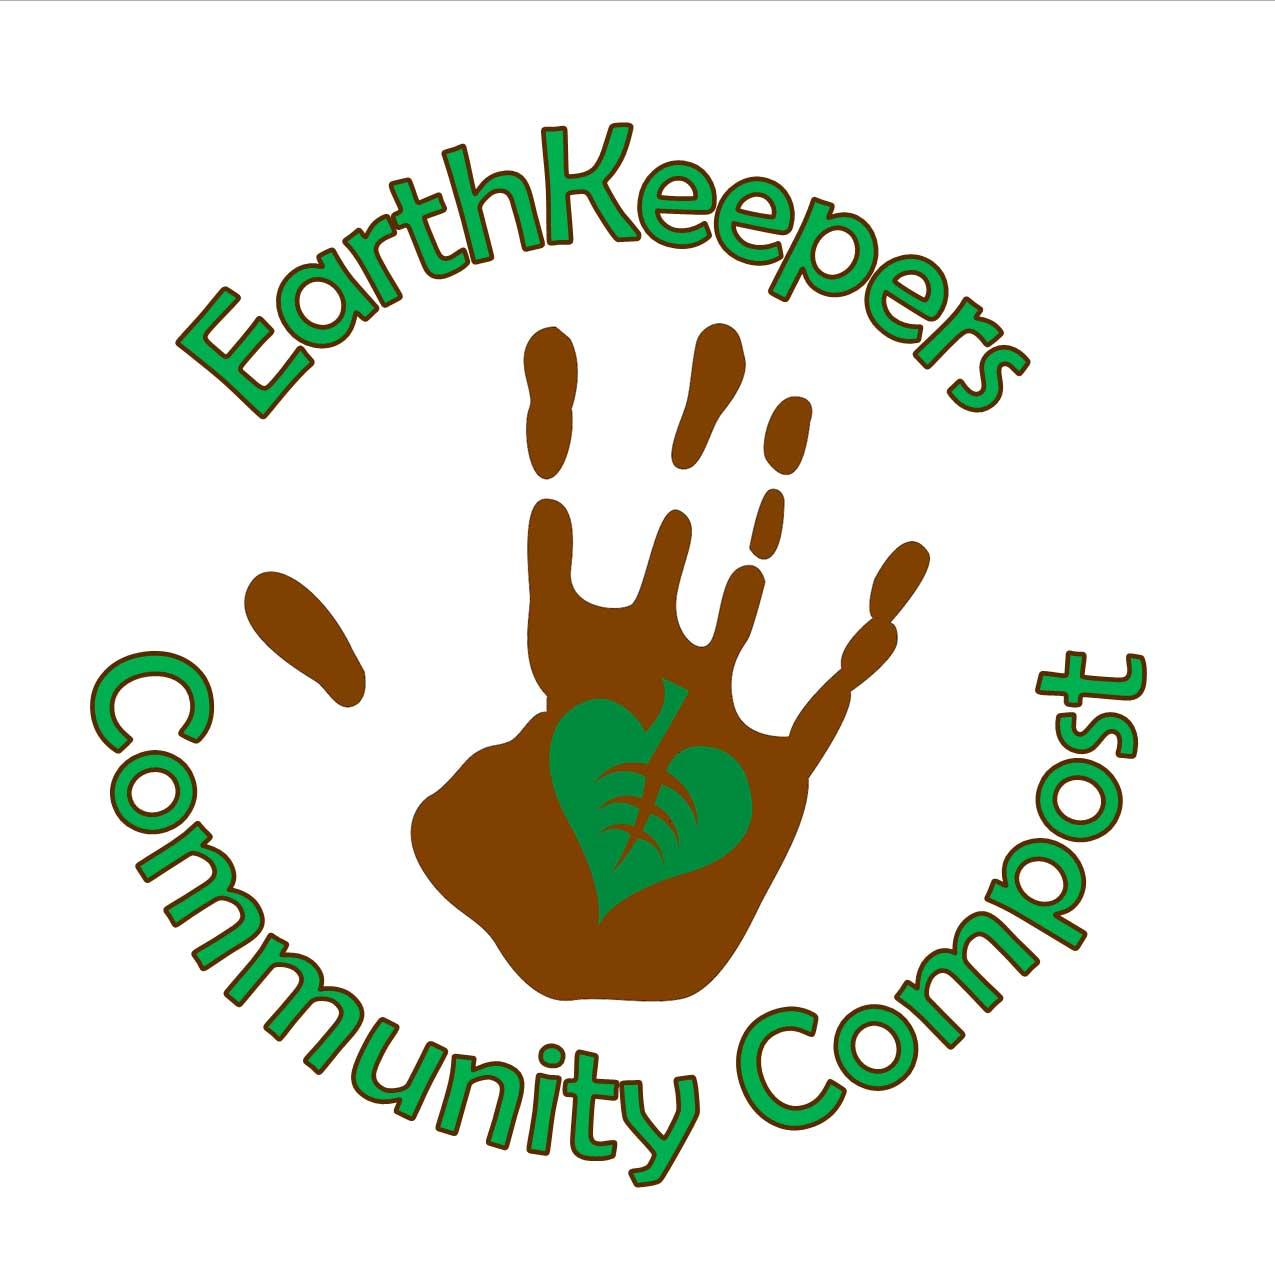 earthkeepers_draftlogo1_ff copy